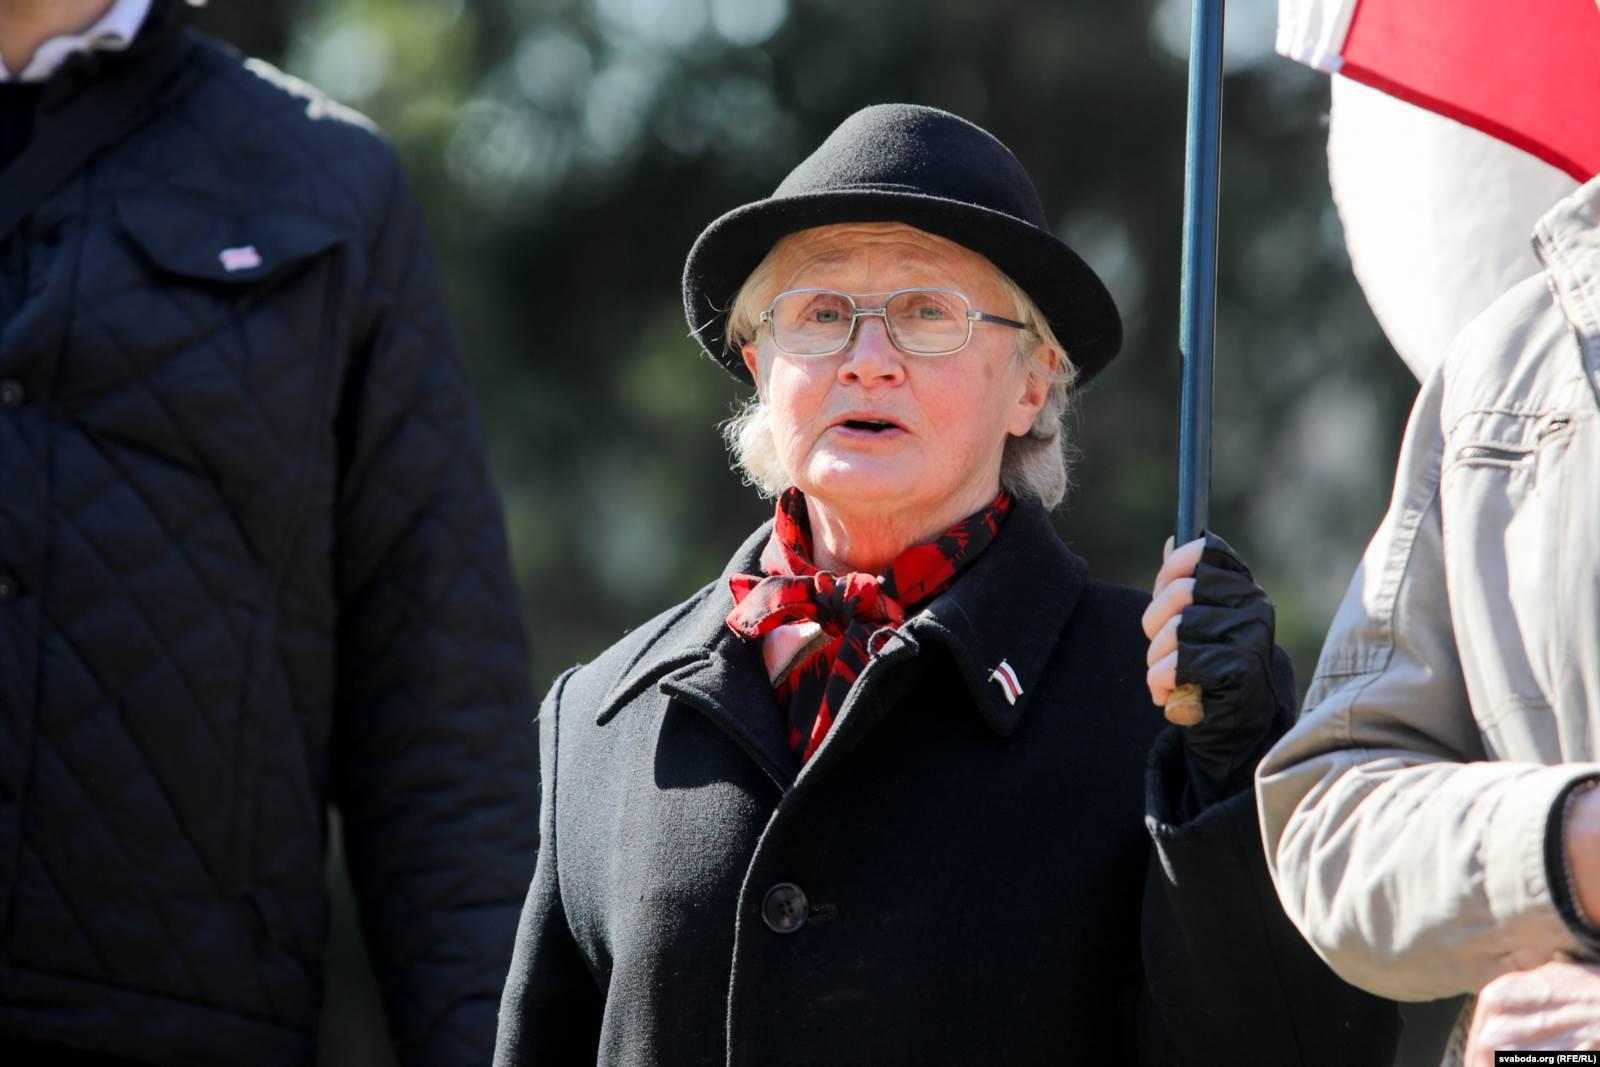 Нина Багинская в Куропатах, 5 апреля 2015 года. Фото: svaboda.org (RFE/RL)